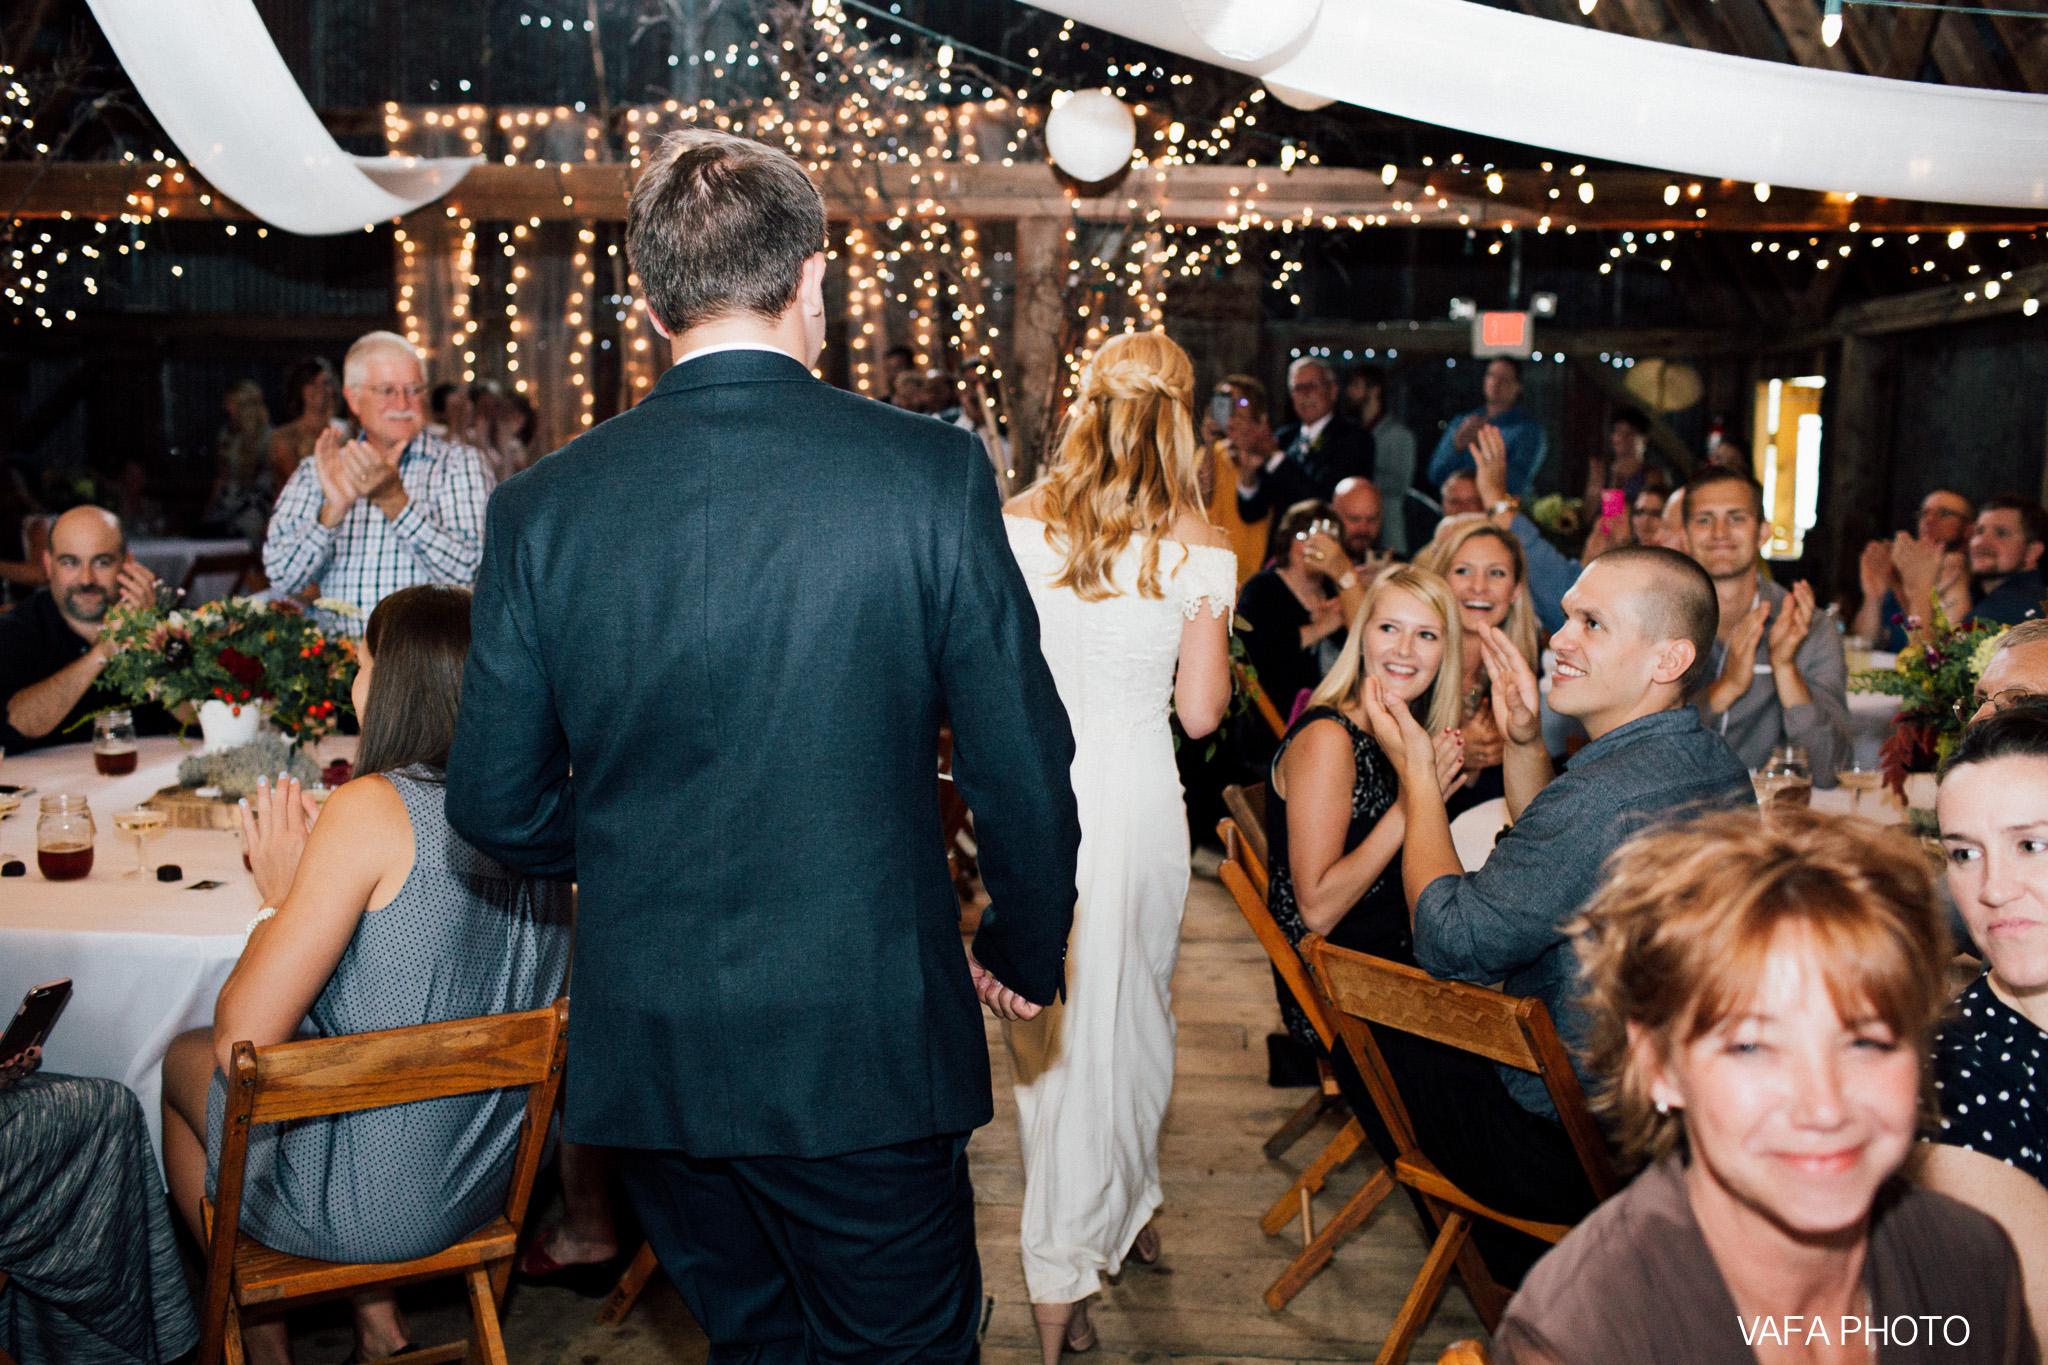 Belsolda-Farm-Wedding-Christy-Eric-Vafa-Photo-597.jpg